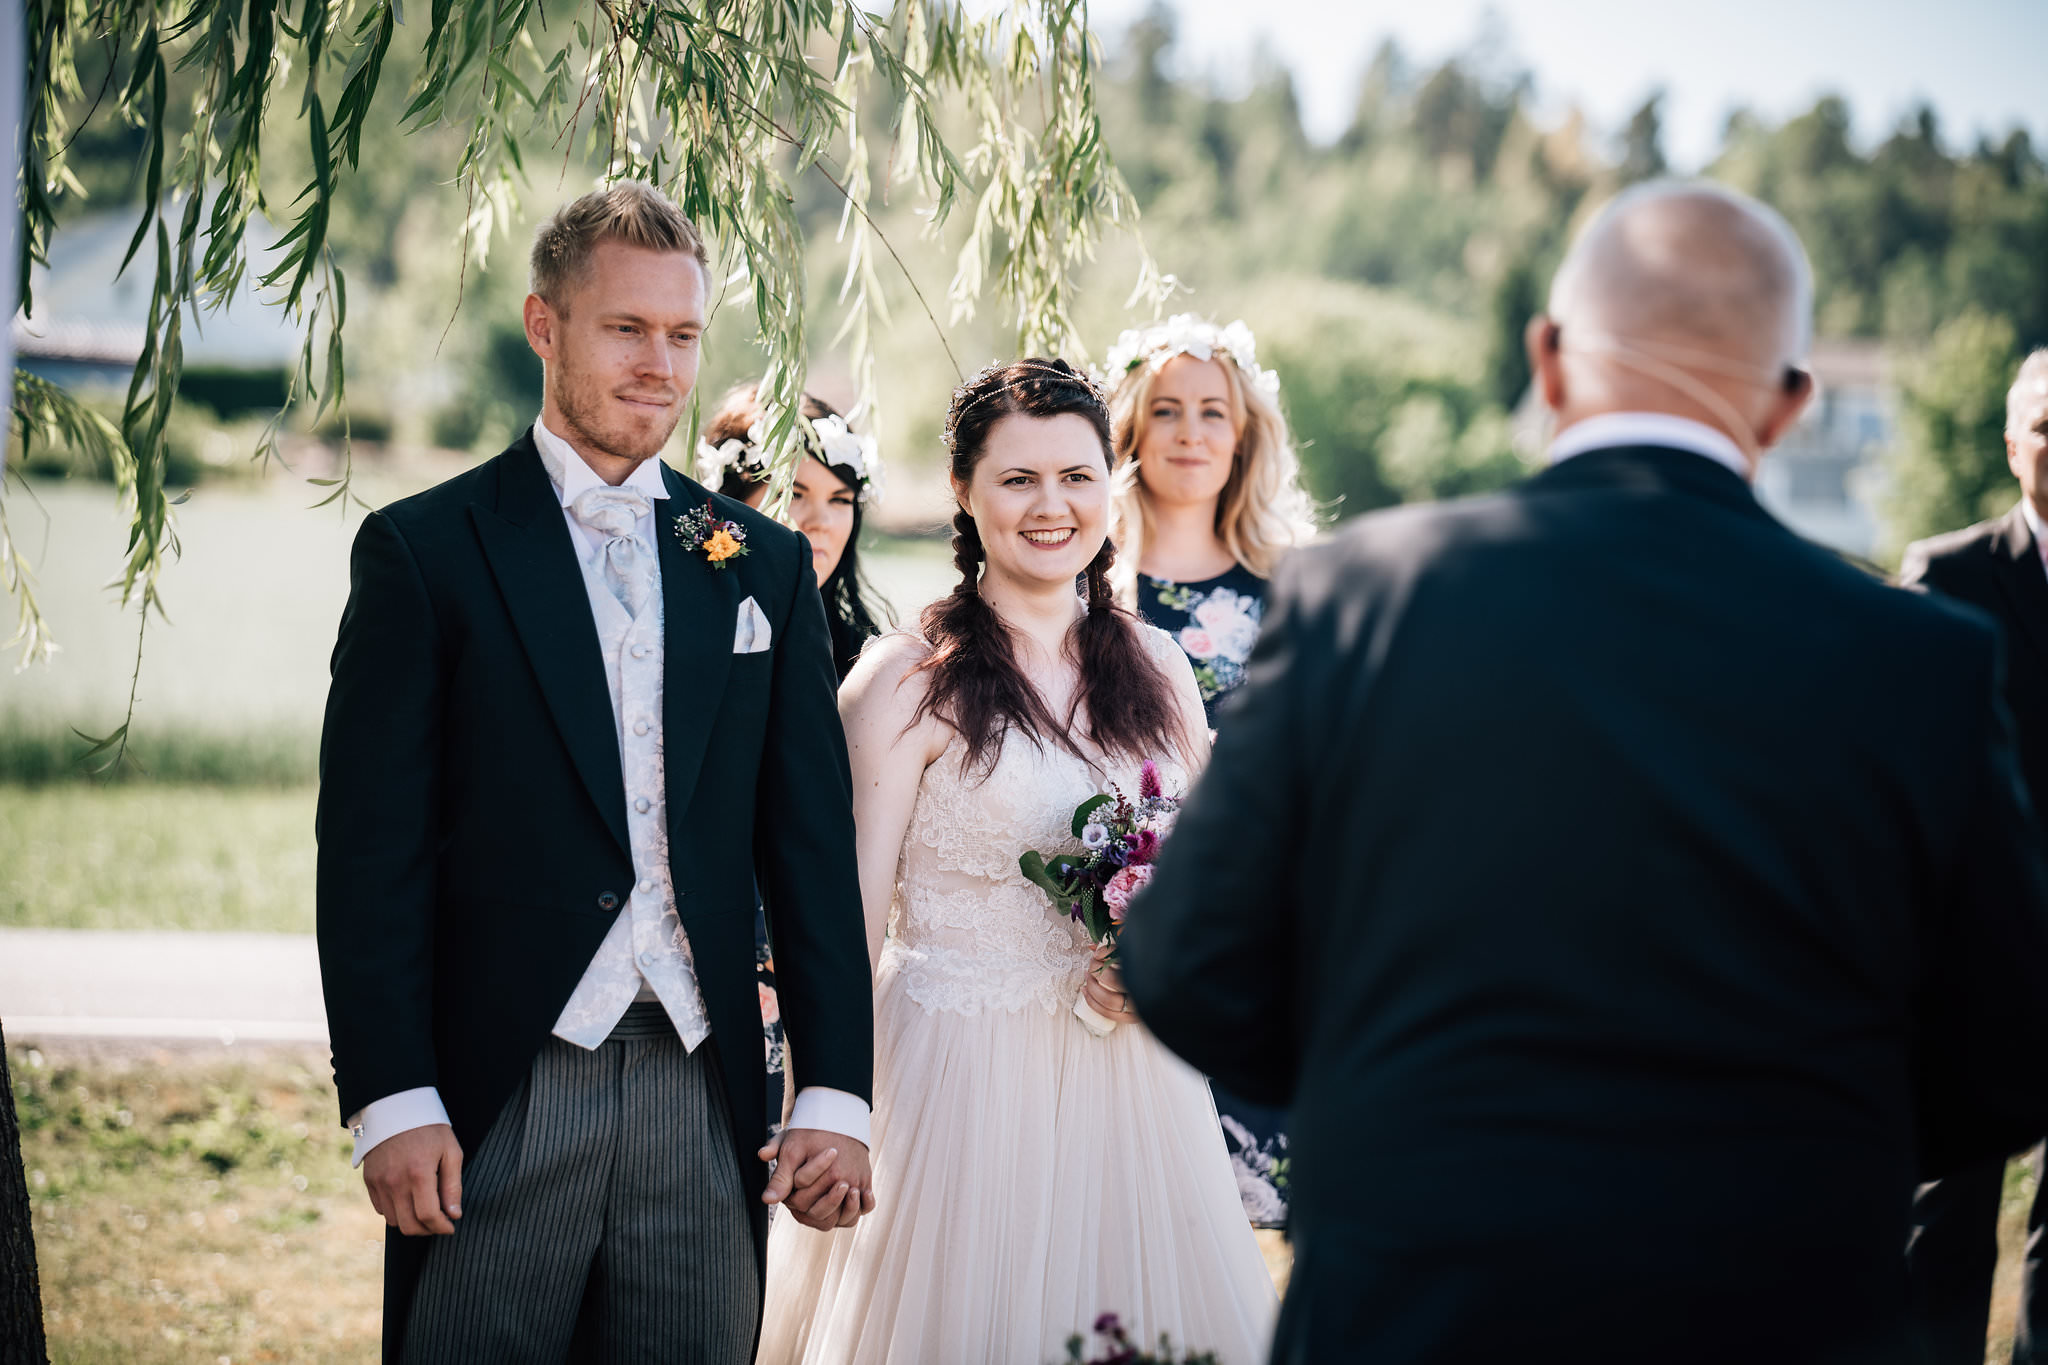 _N850215-fotograf-vestfold-bryllupsfotograf-.jpg